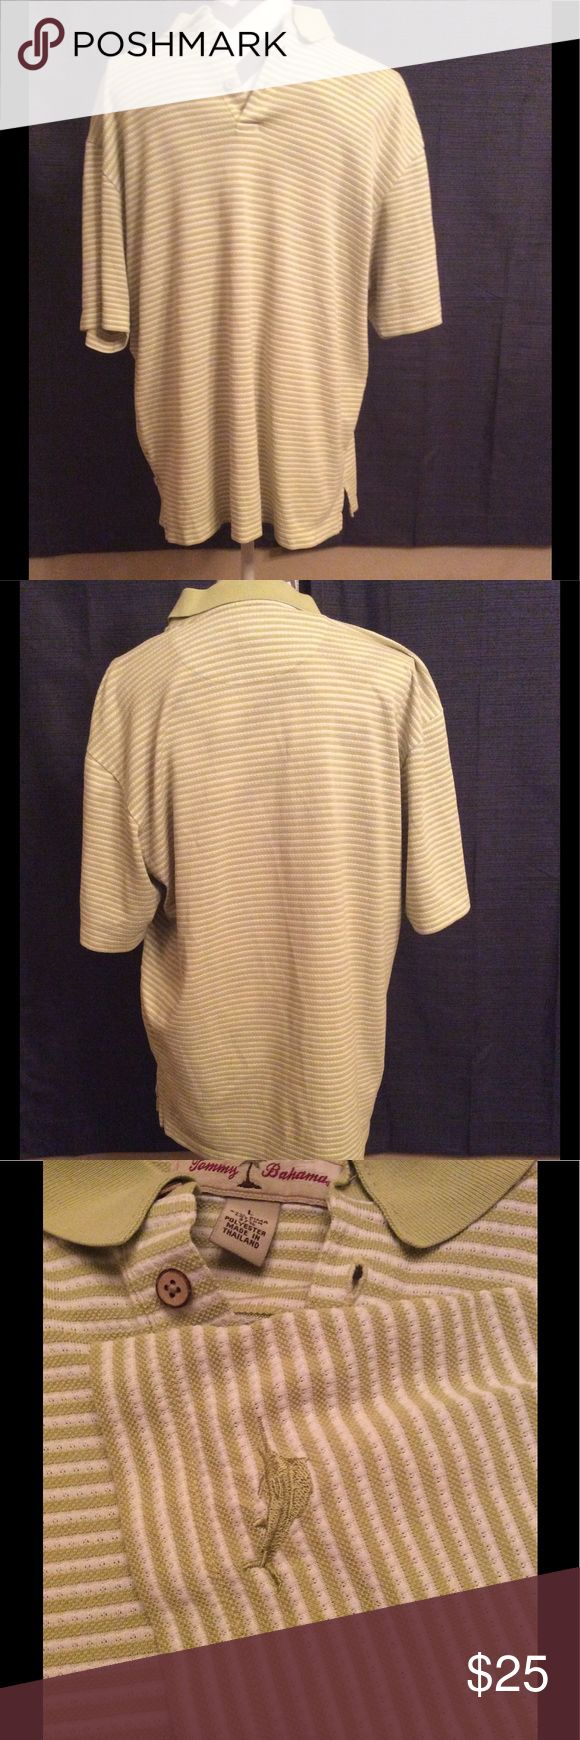 Tommy Bahama green striped polo shirt Tommy Bahama green striped polo shirt. Signature logo on sleeve. Tommy Bahama Shirts Polos